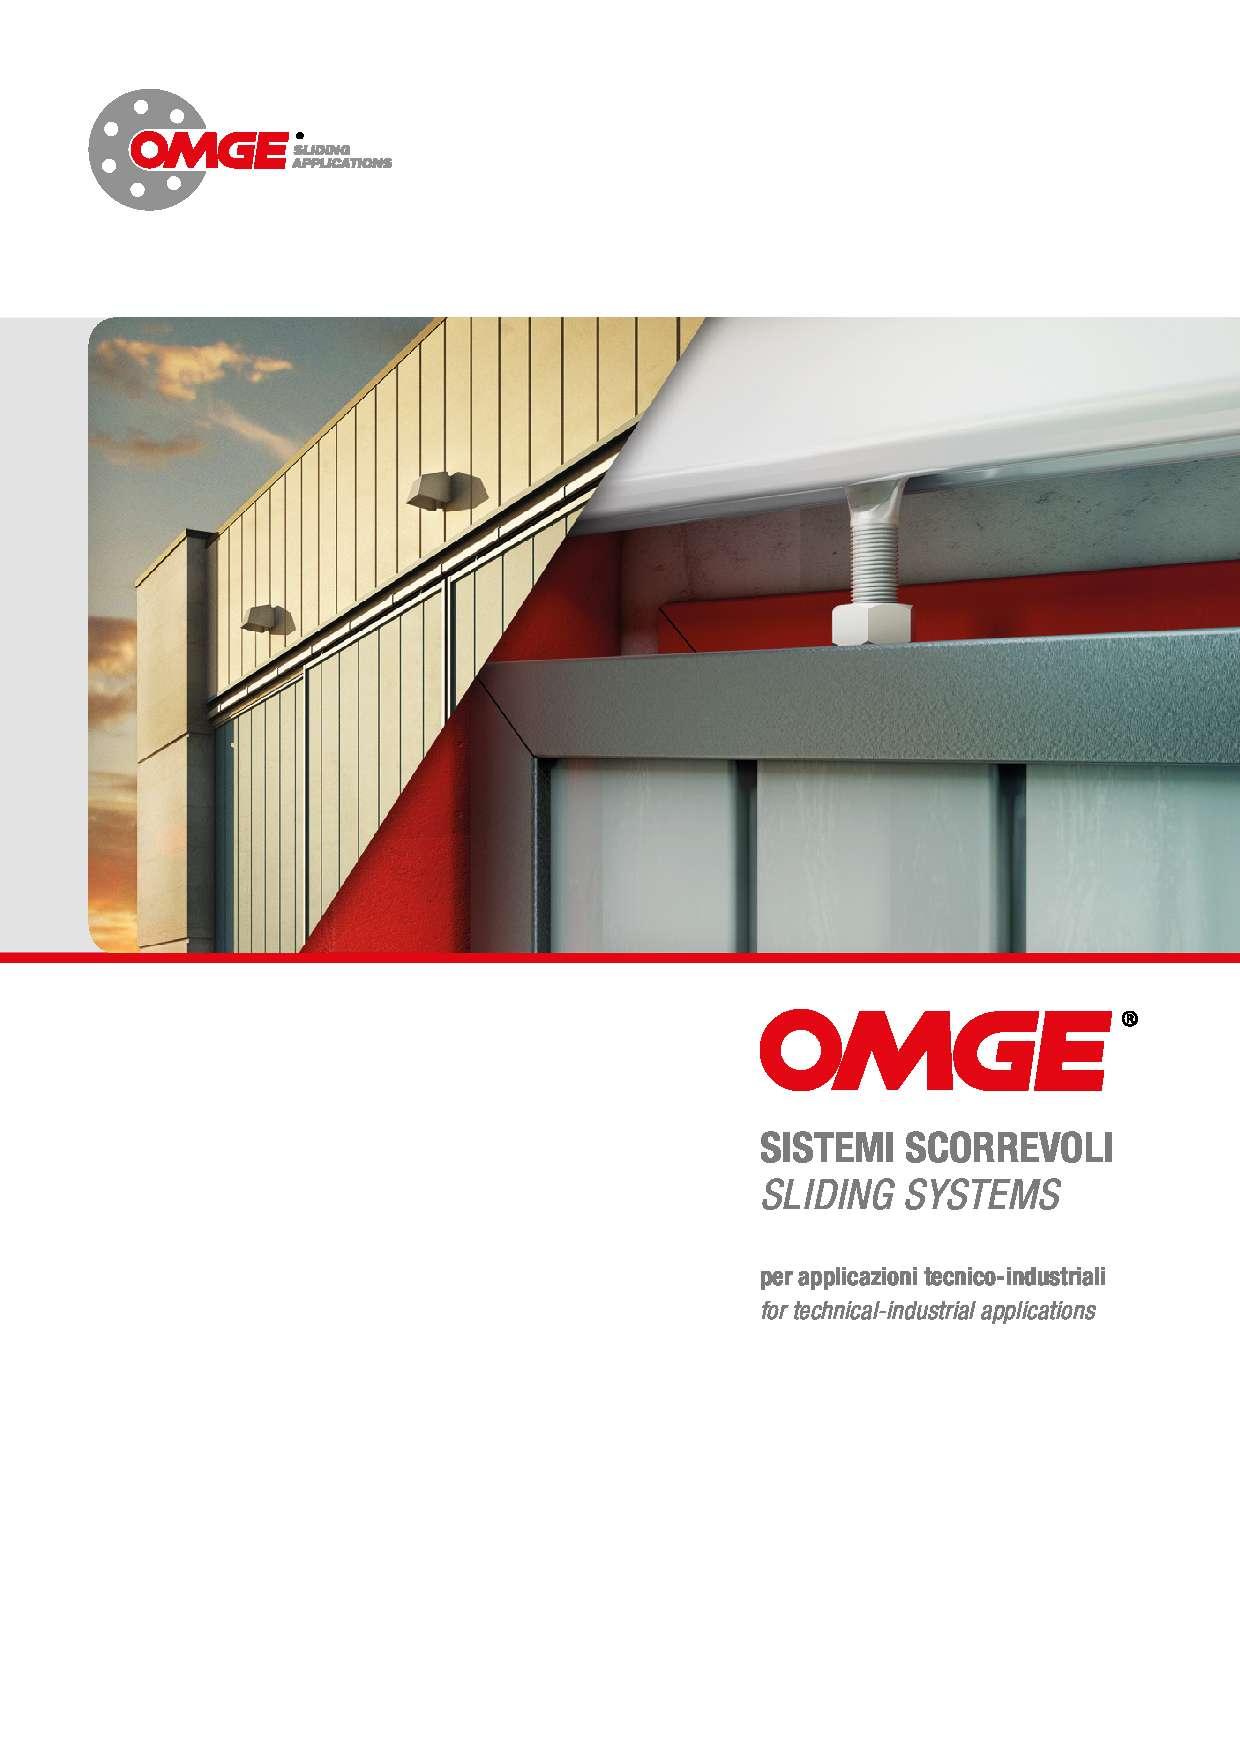 Sistemi scorrevoli tecnico industriali di OMGE